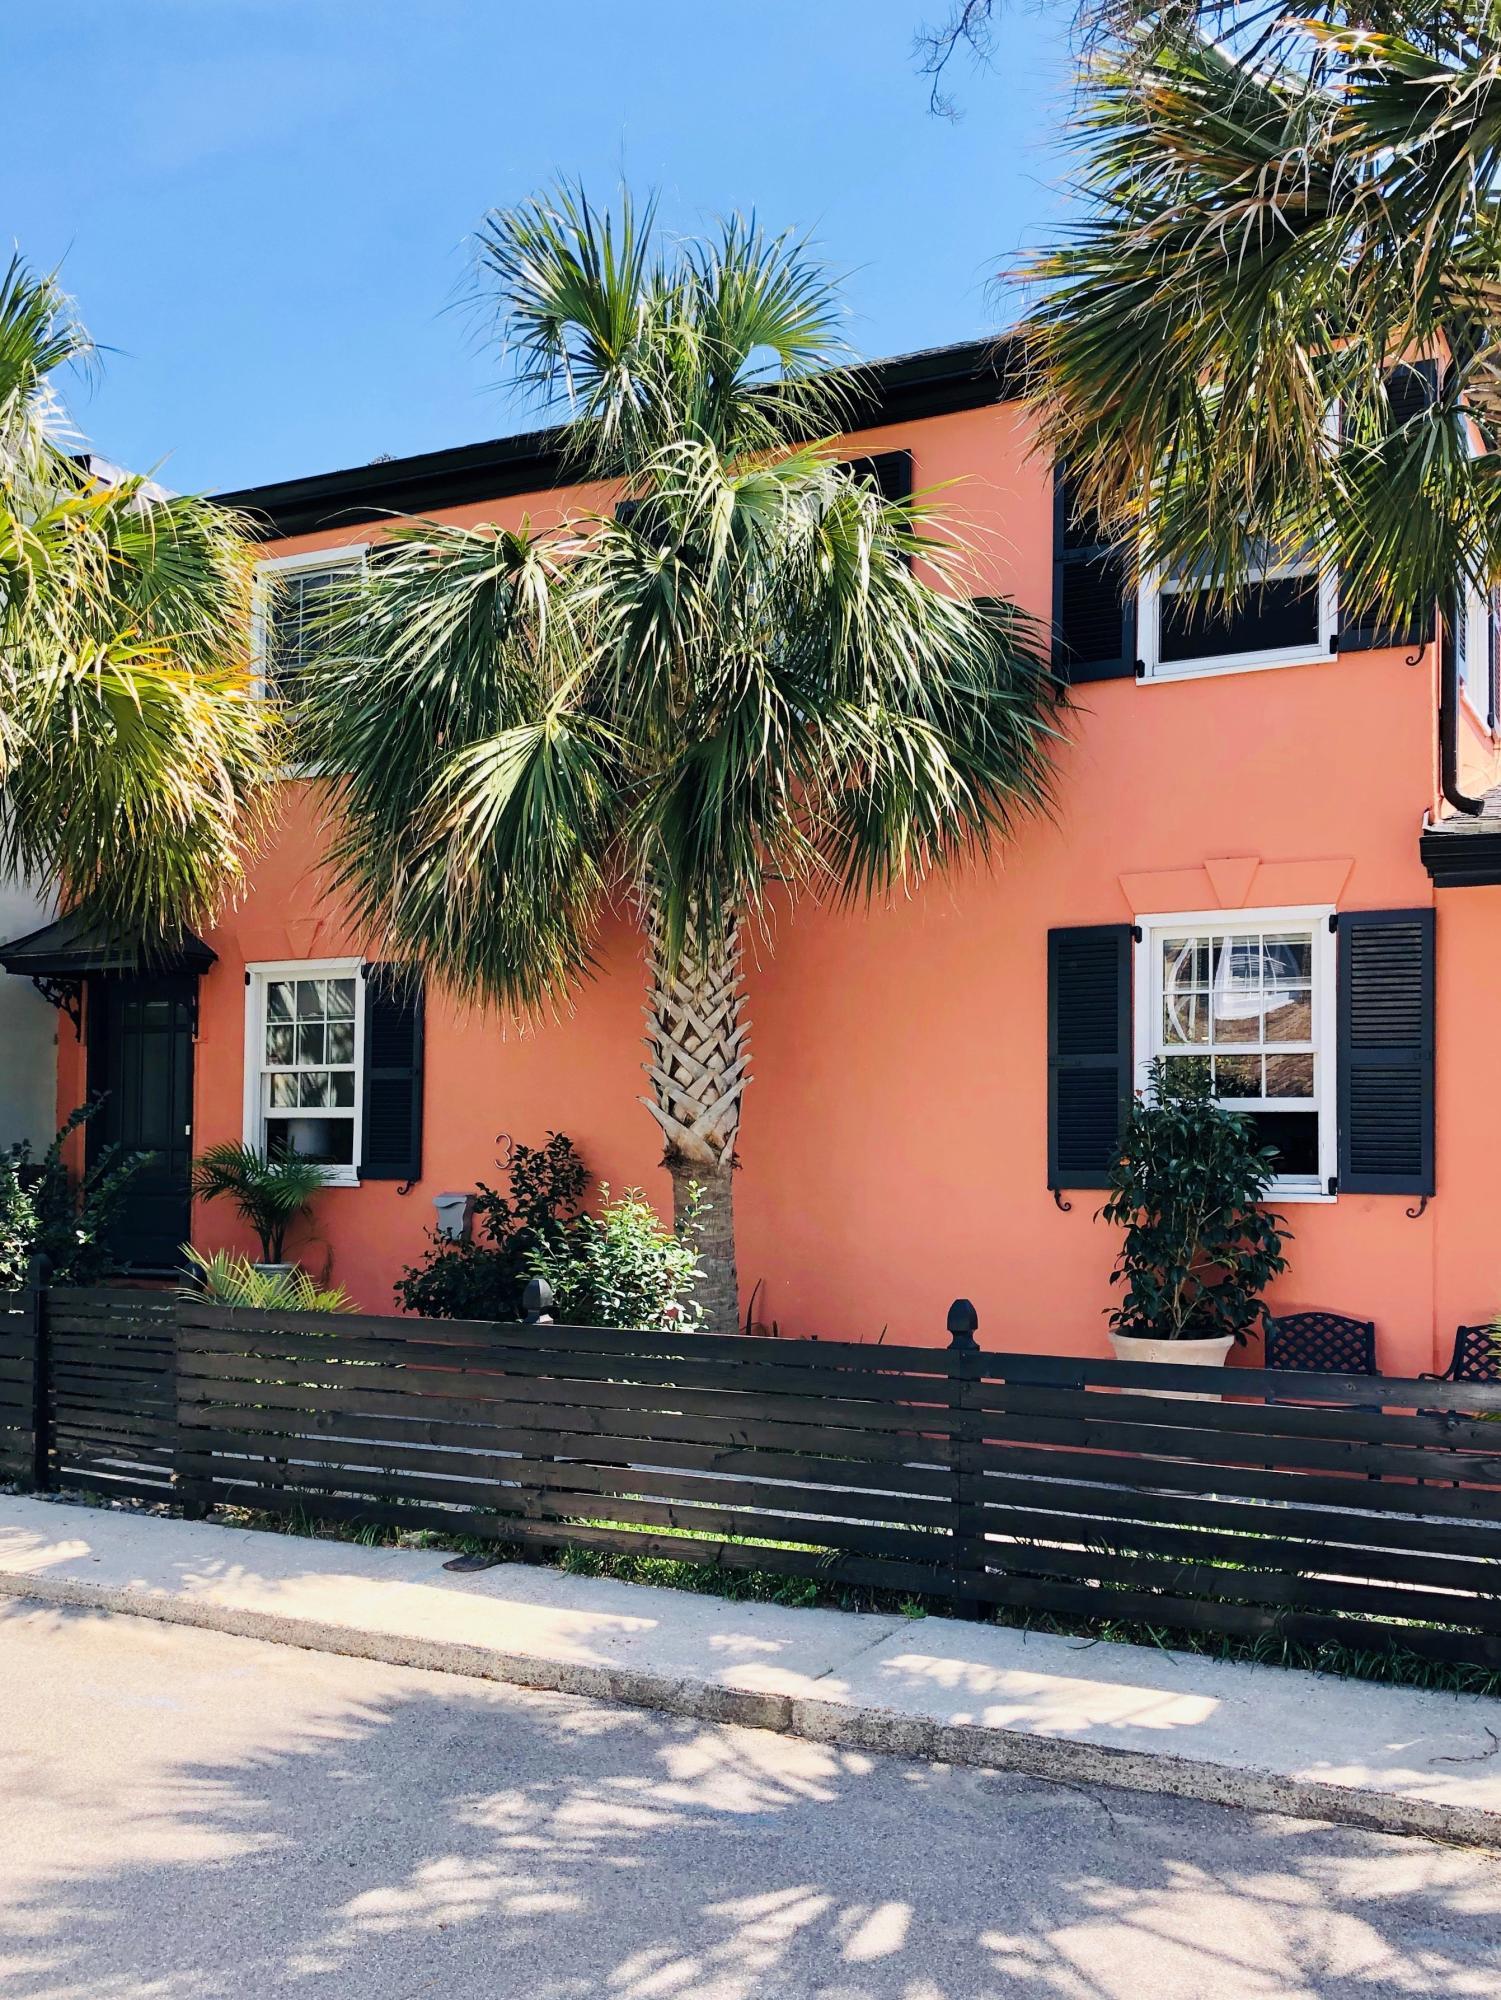 3 Poulnot Lane Charleston, SC 29401